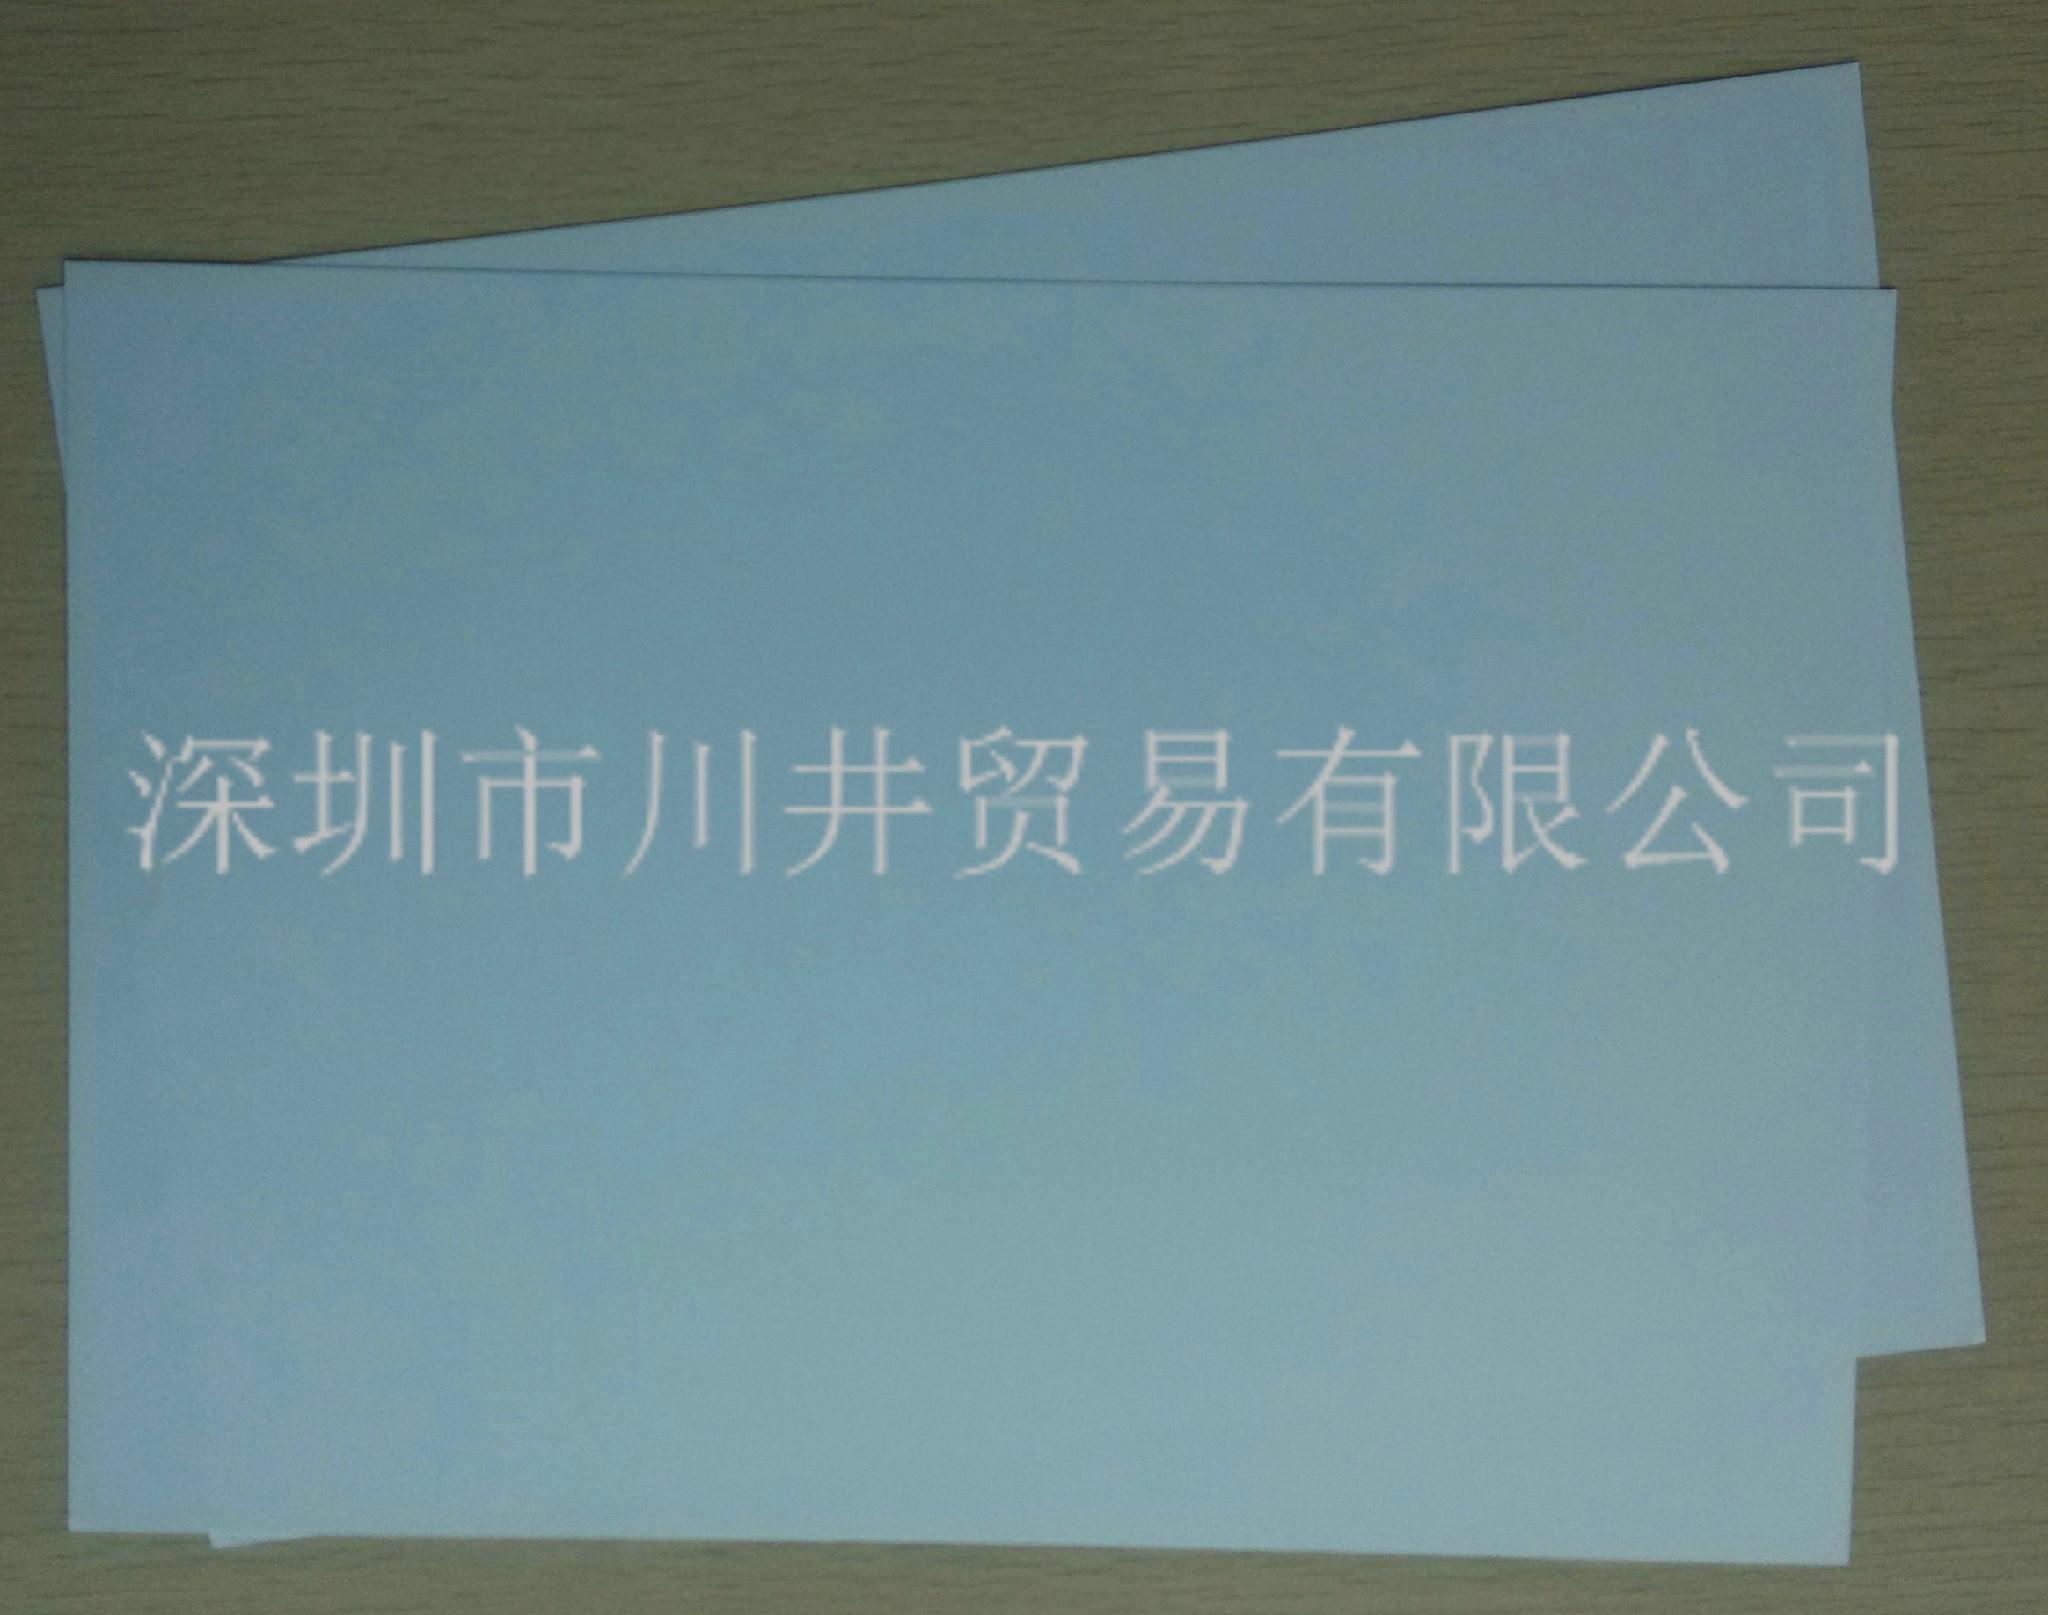 东丽E28G TORAY LUMIRROR E28G PET FILM 3